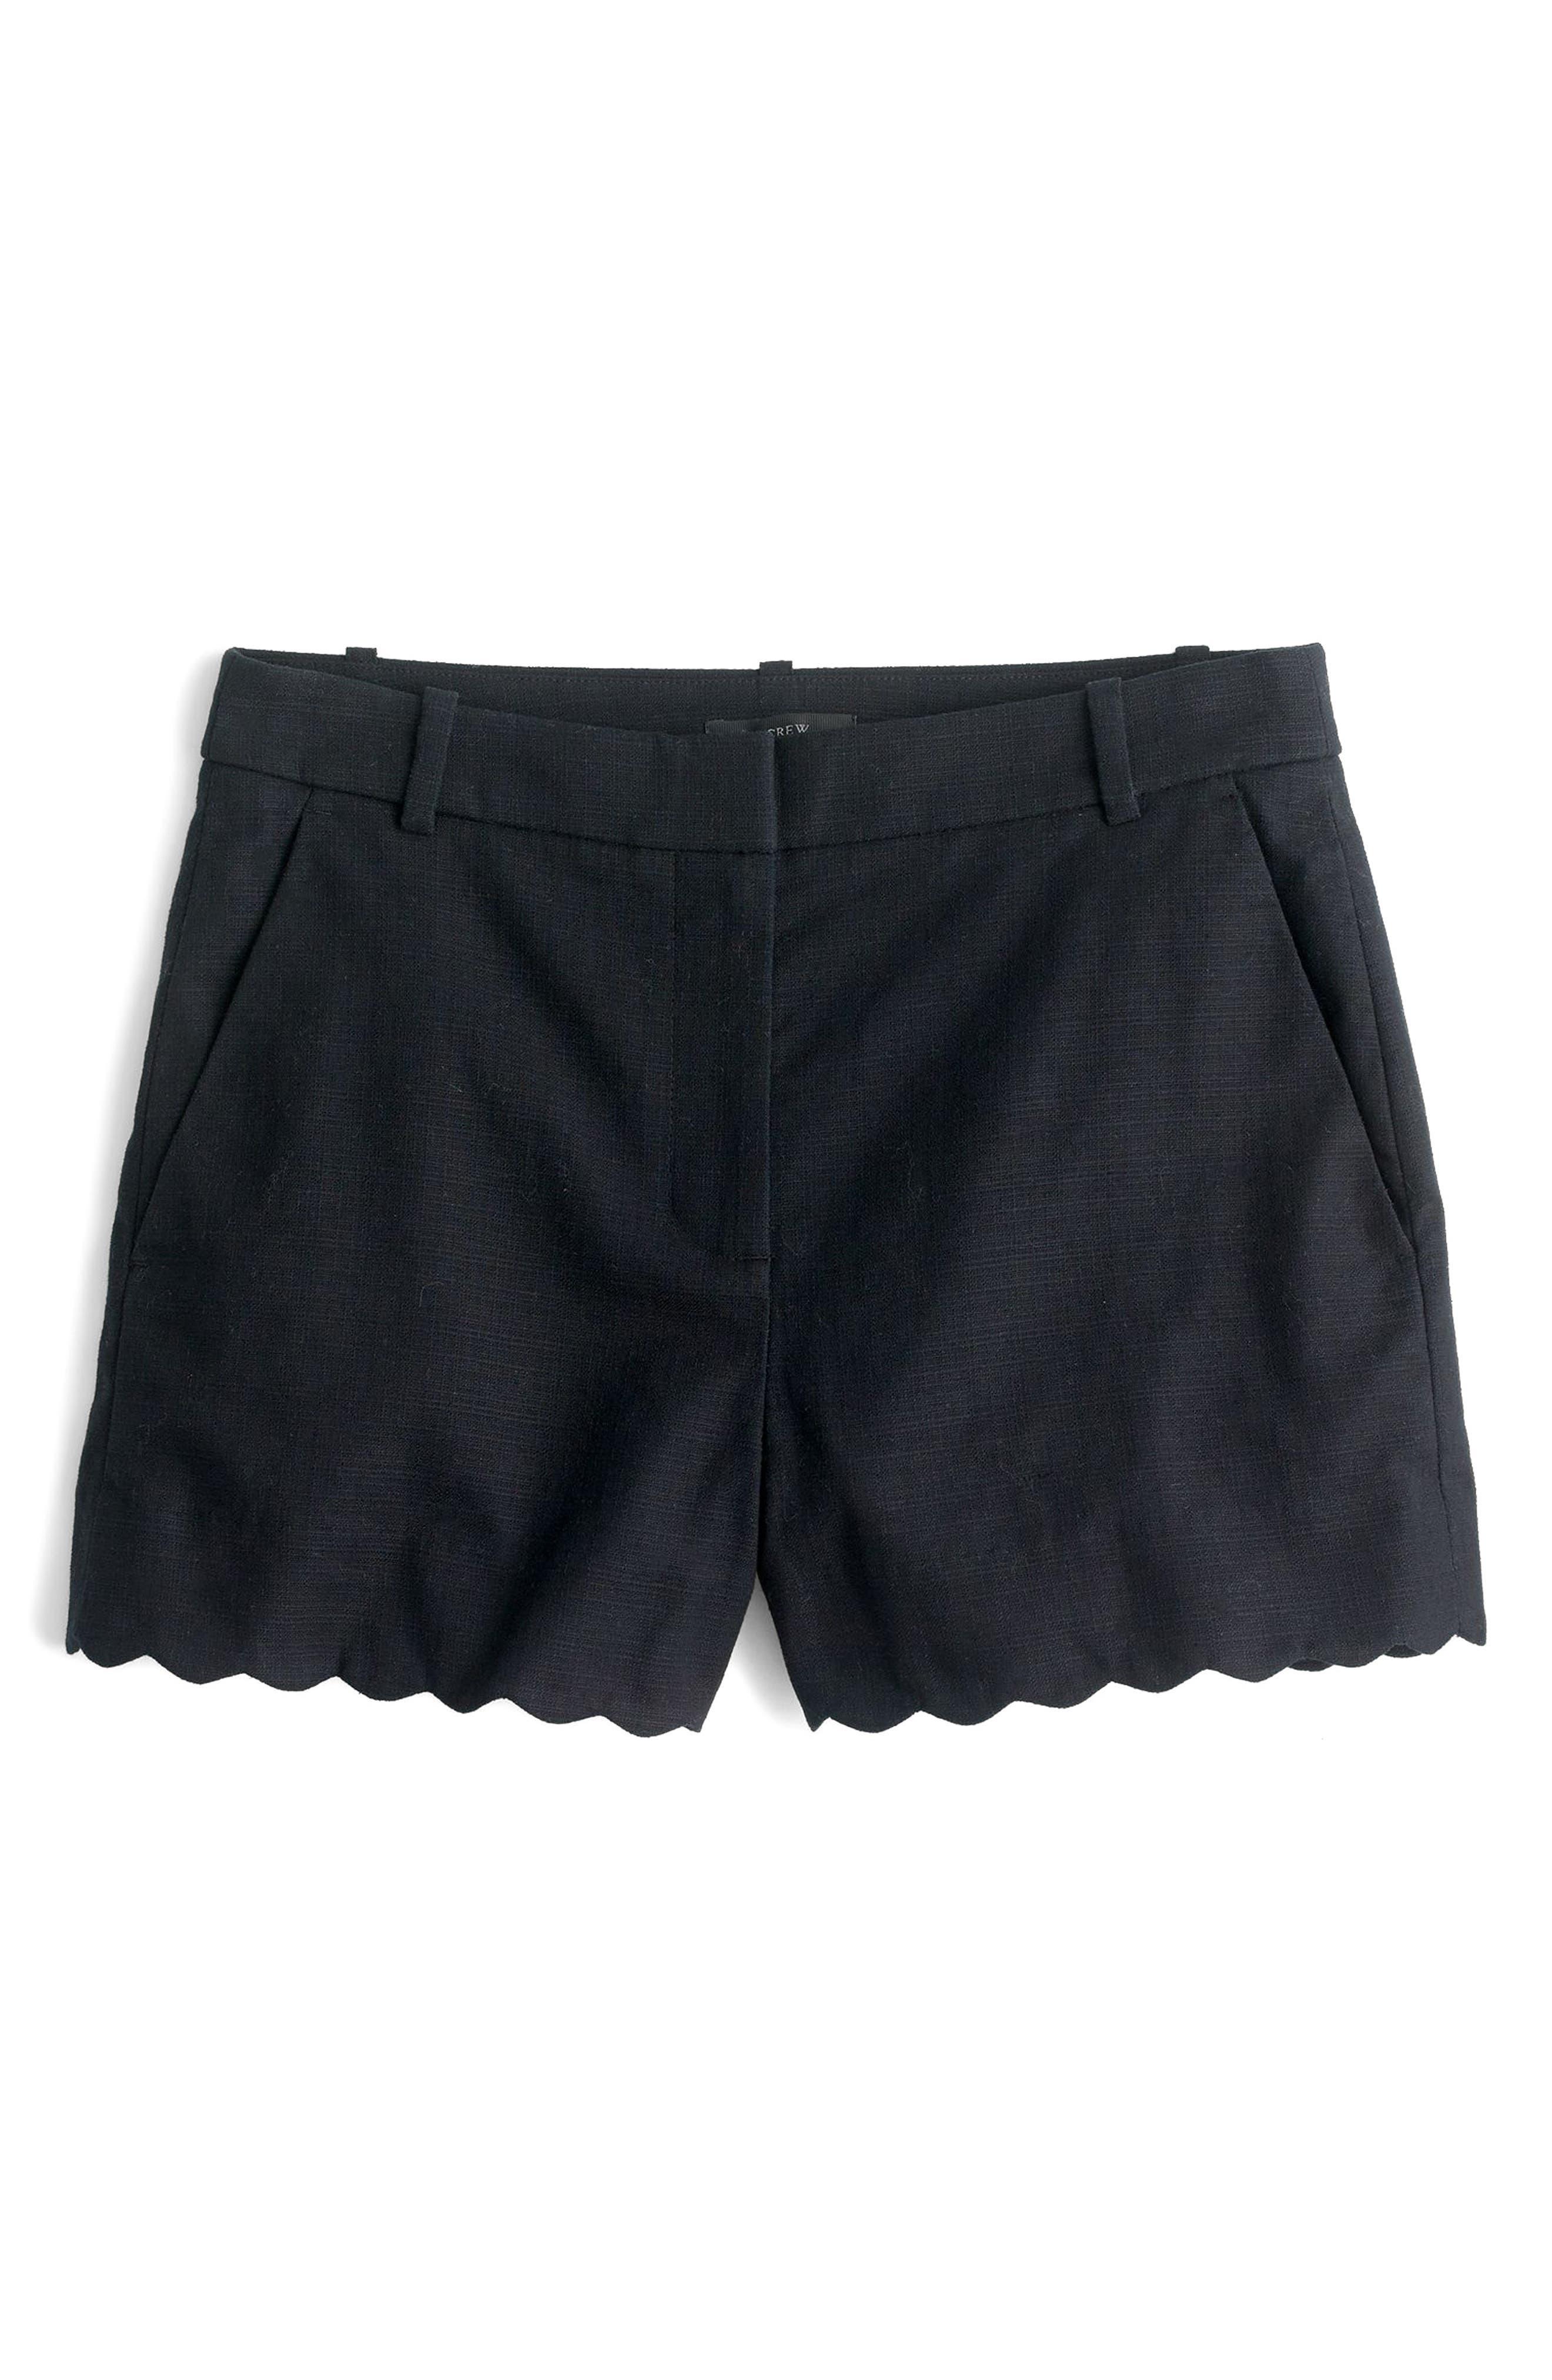 Fiesta Scallop Hem Stretch Cotton Shorts,                             Main thumbnail 1, color,                             001